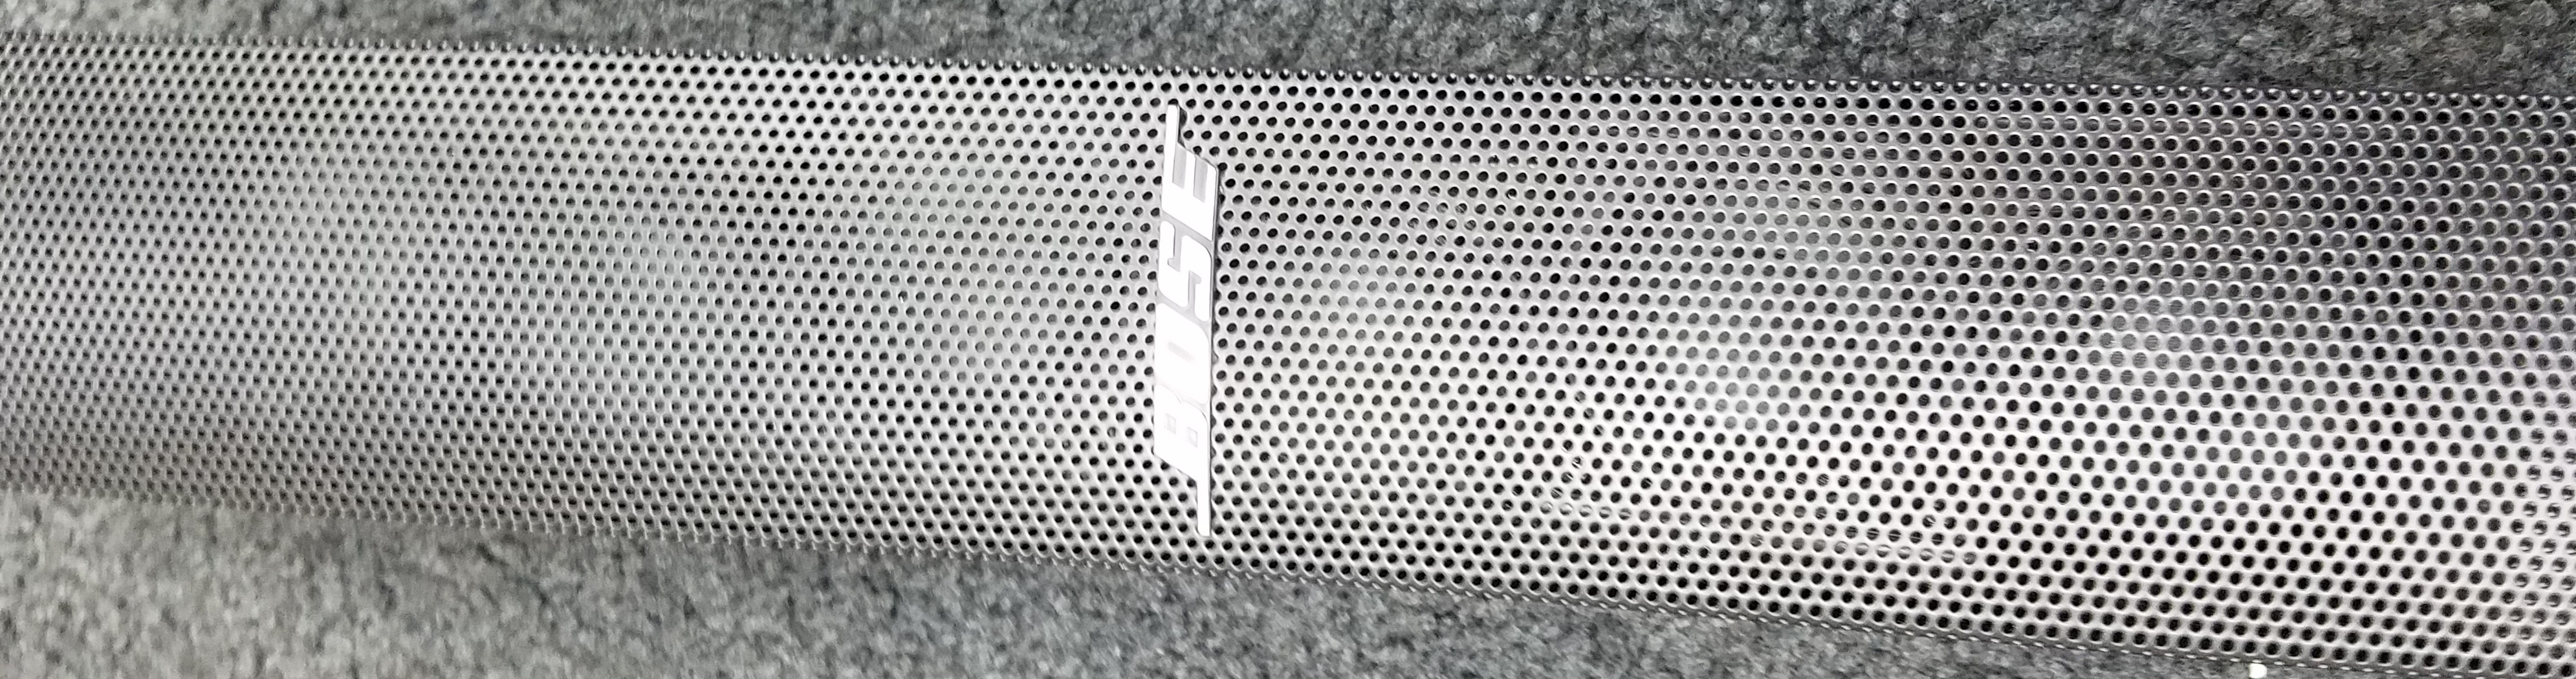 BOSE - L1 COMPACT - STEREO/AUDIO/RADIO